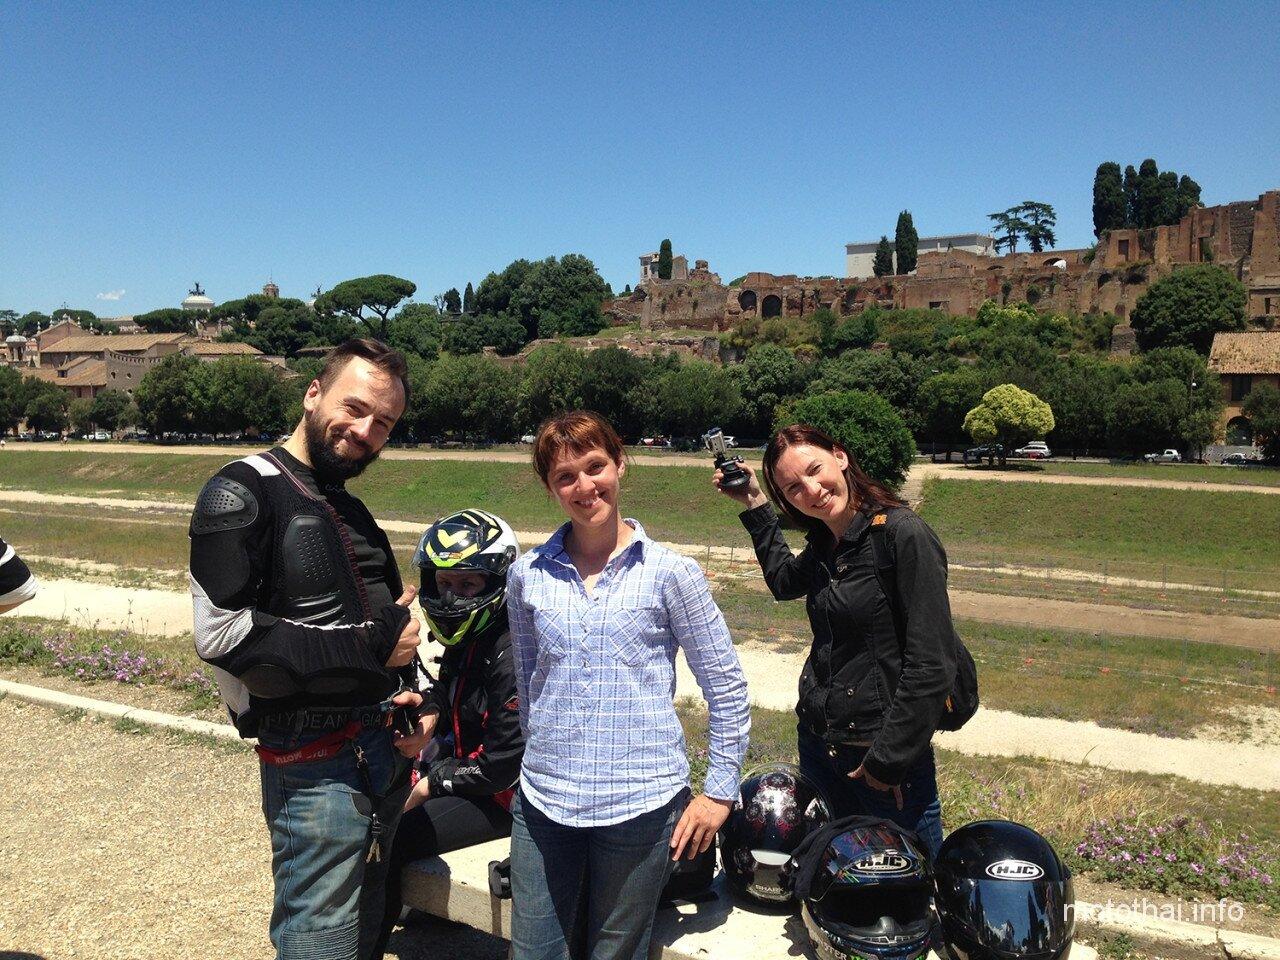 Экскурсии по Риму на мотоцикле